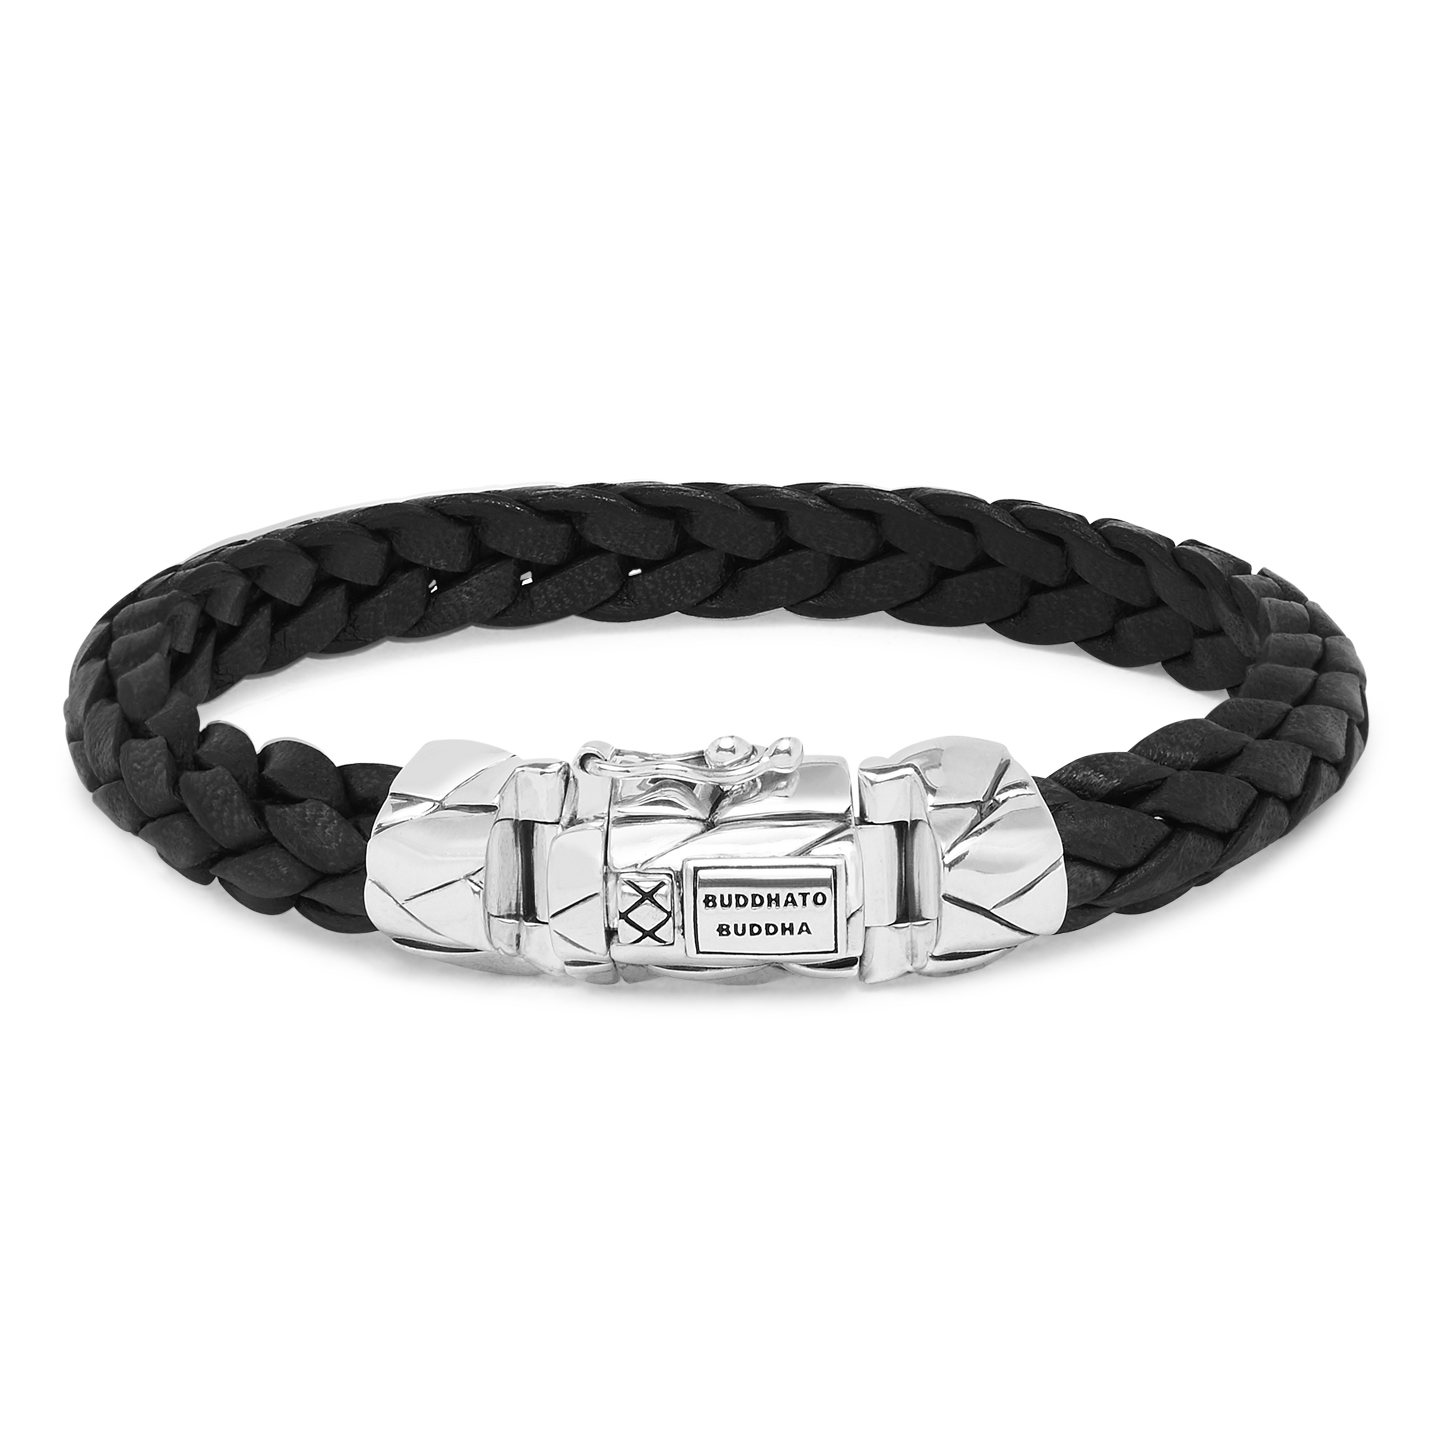 Buddha to Buddha 126BL Armband Mangky Small leder zwart (E ) 20 cm